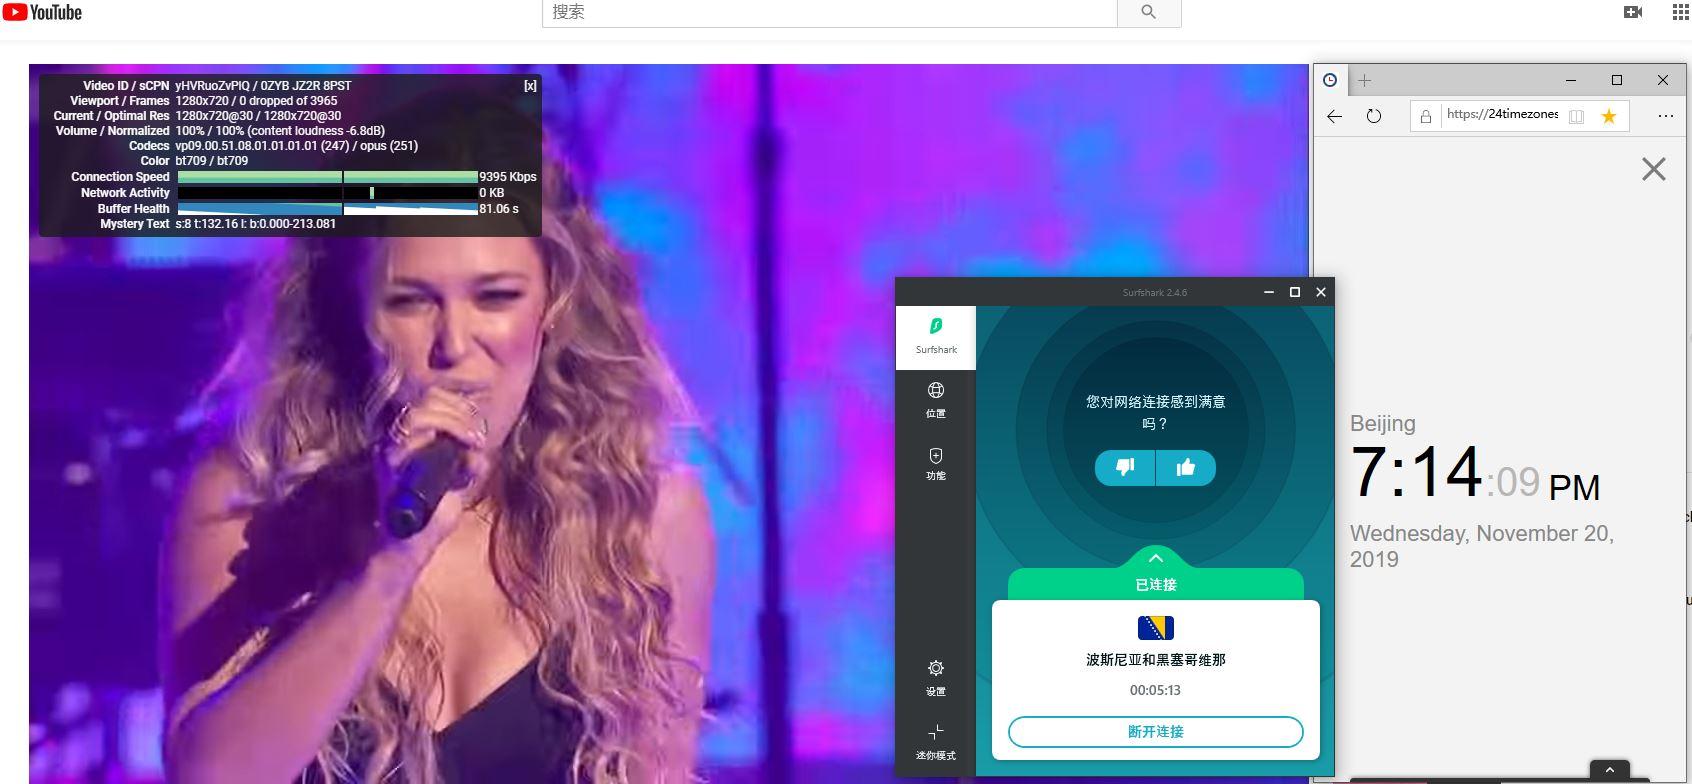 Windows SurfsharkVPN 波斯尼亚和黑塞哥维那 中国VPN翻墙 科学上网 Speedtest - 20191120